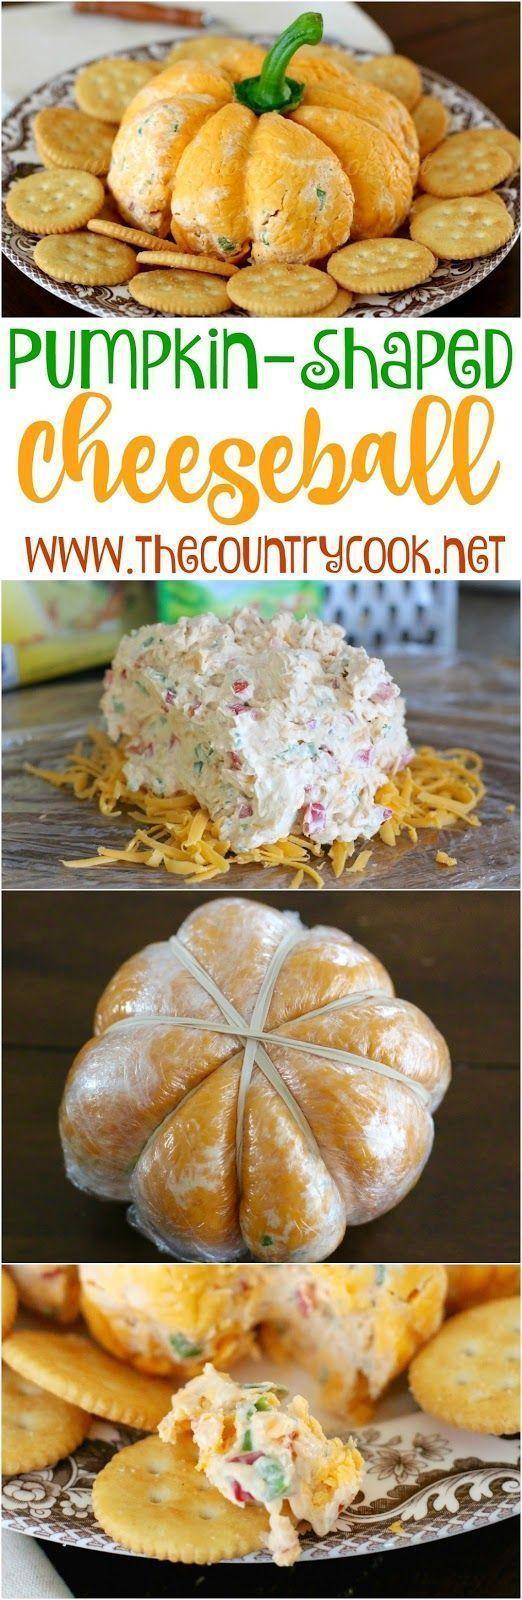 Appetizers For Thanksgiving Dinner  Best 25 Turkey cheese ball ideas on Pinterest